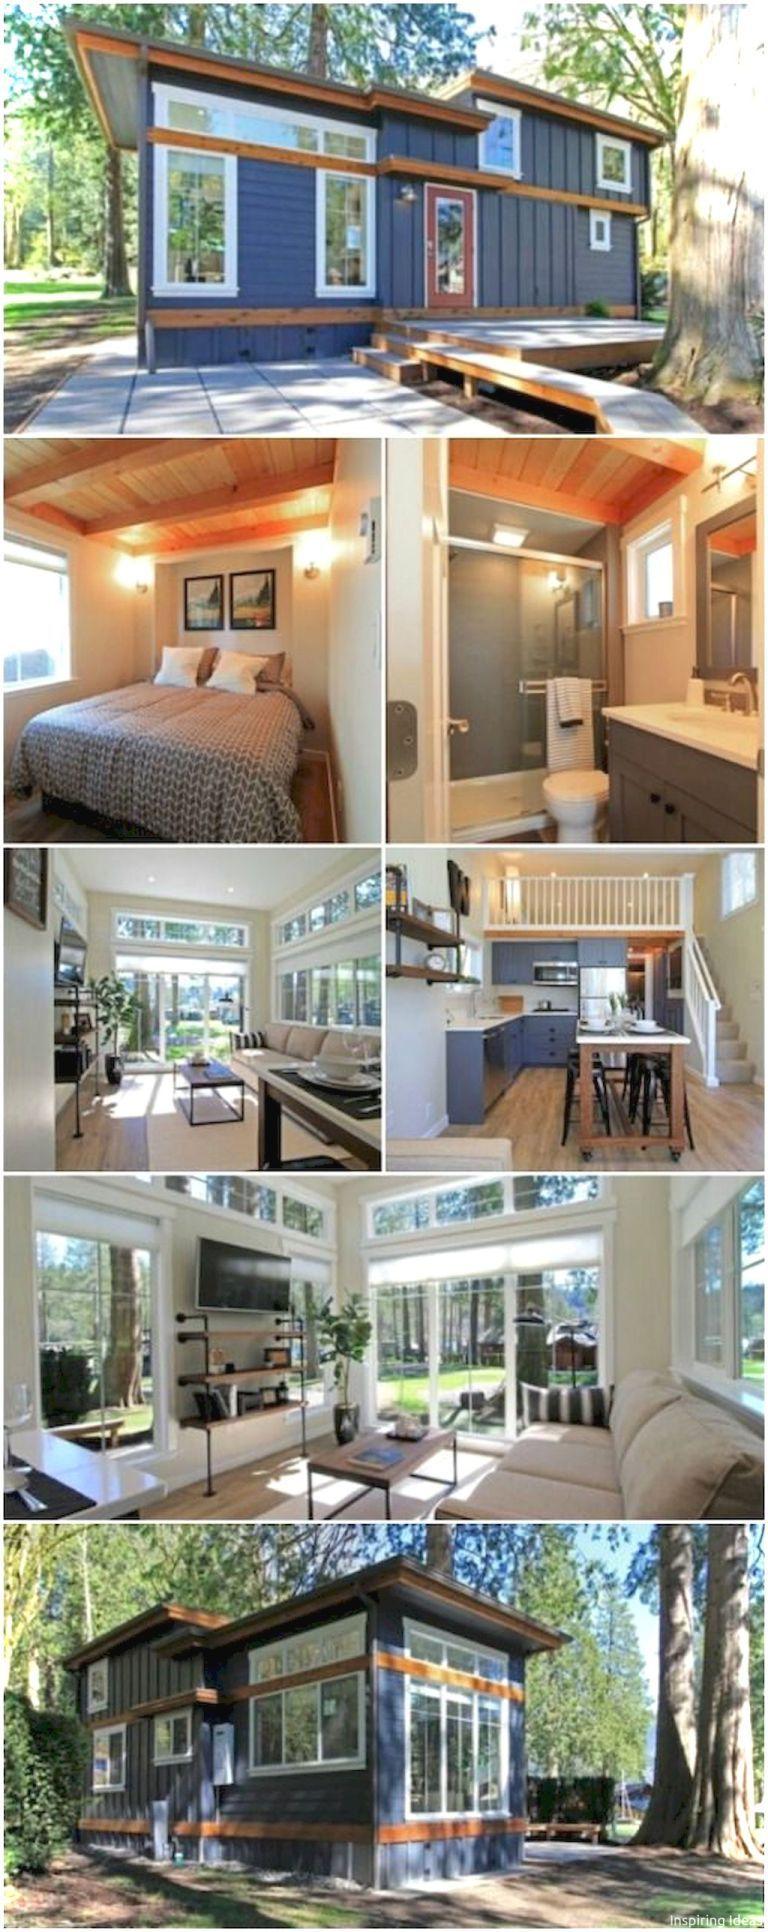 53 awesome tiny house interior ideas 53